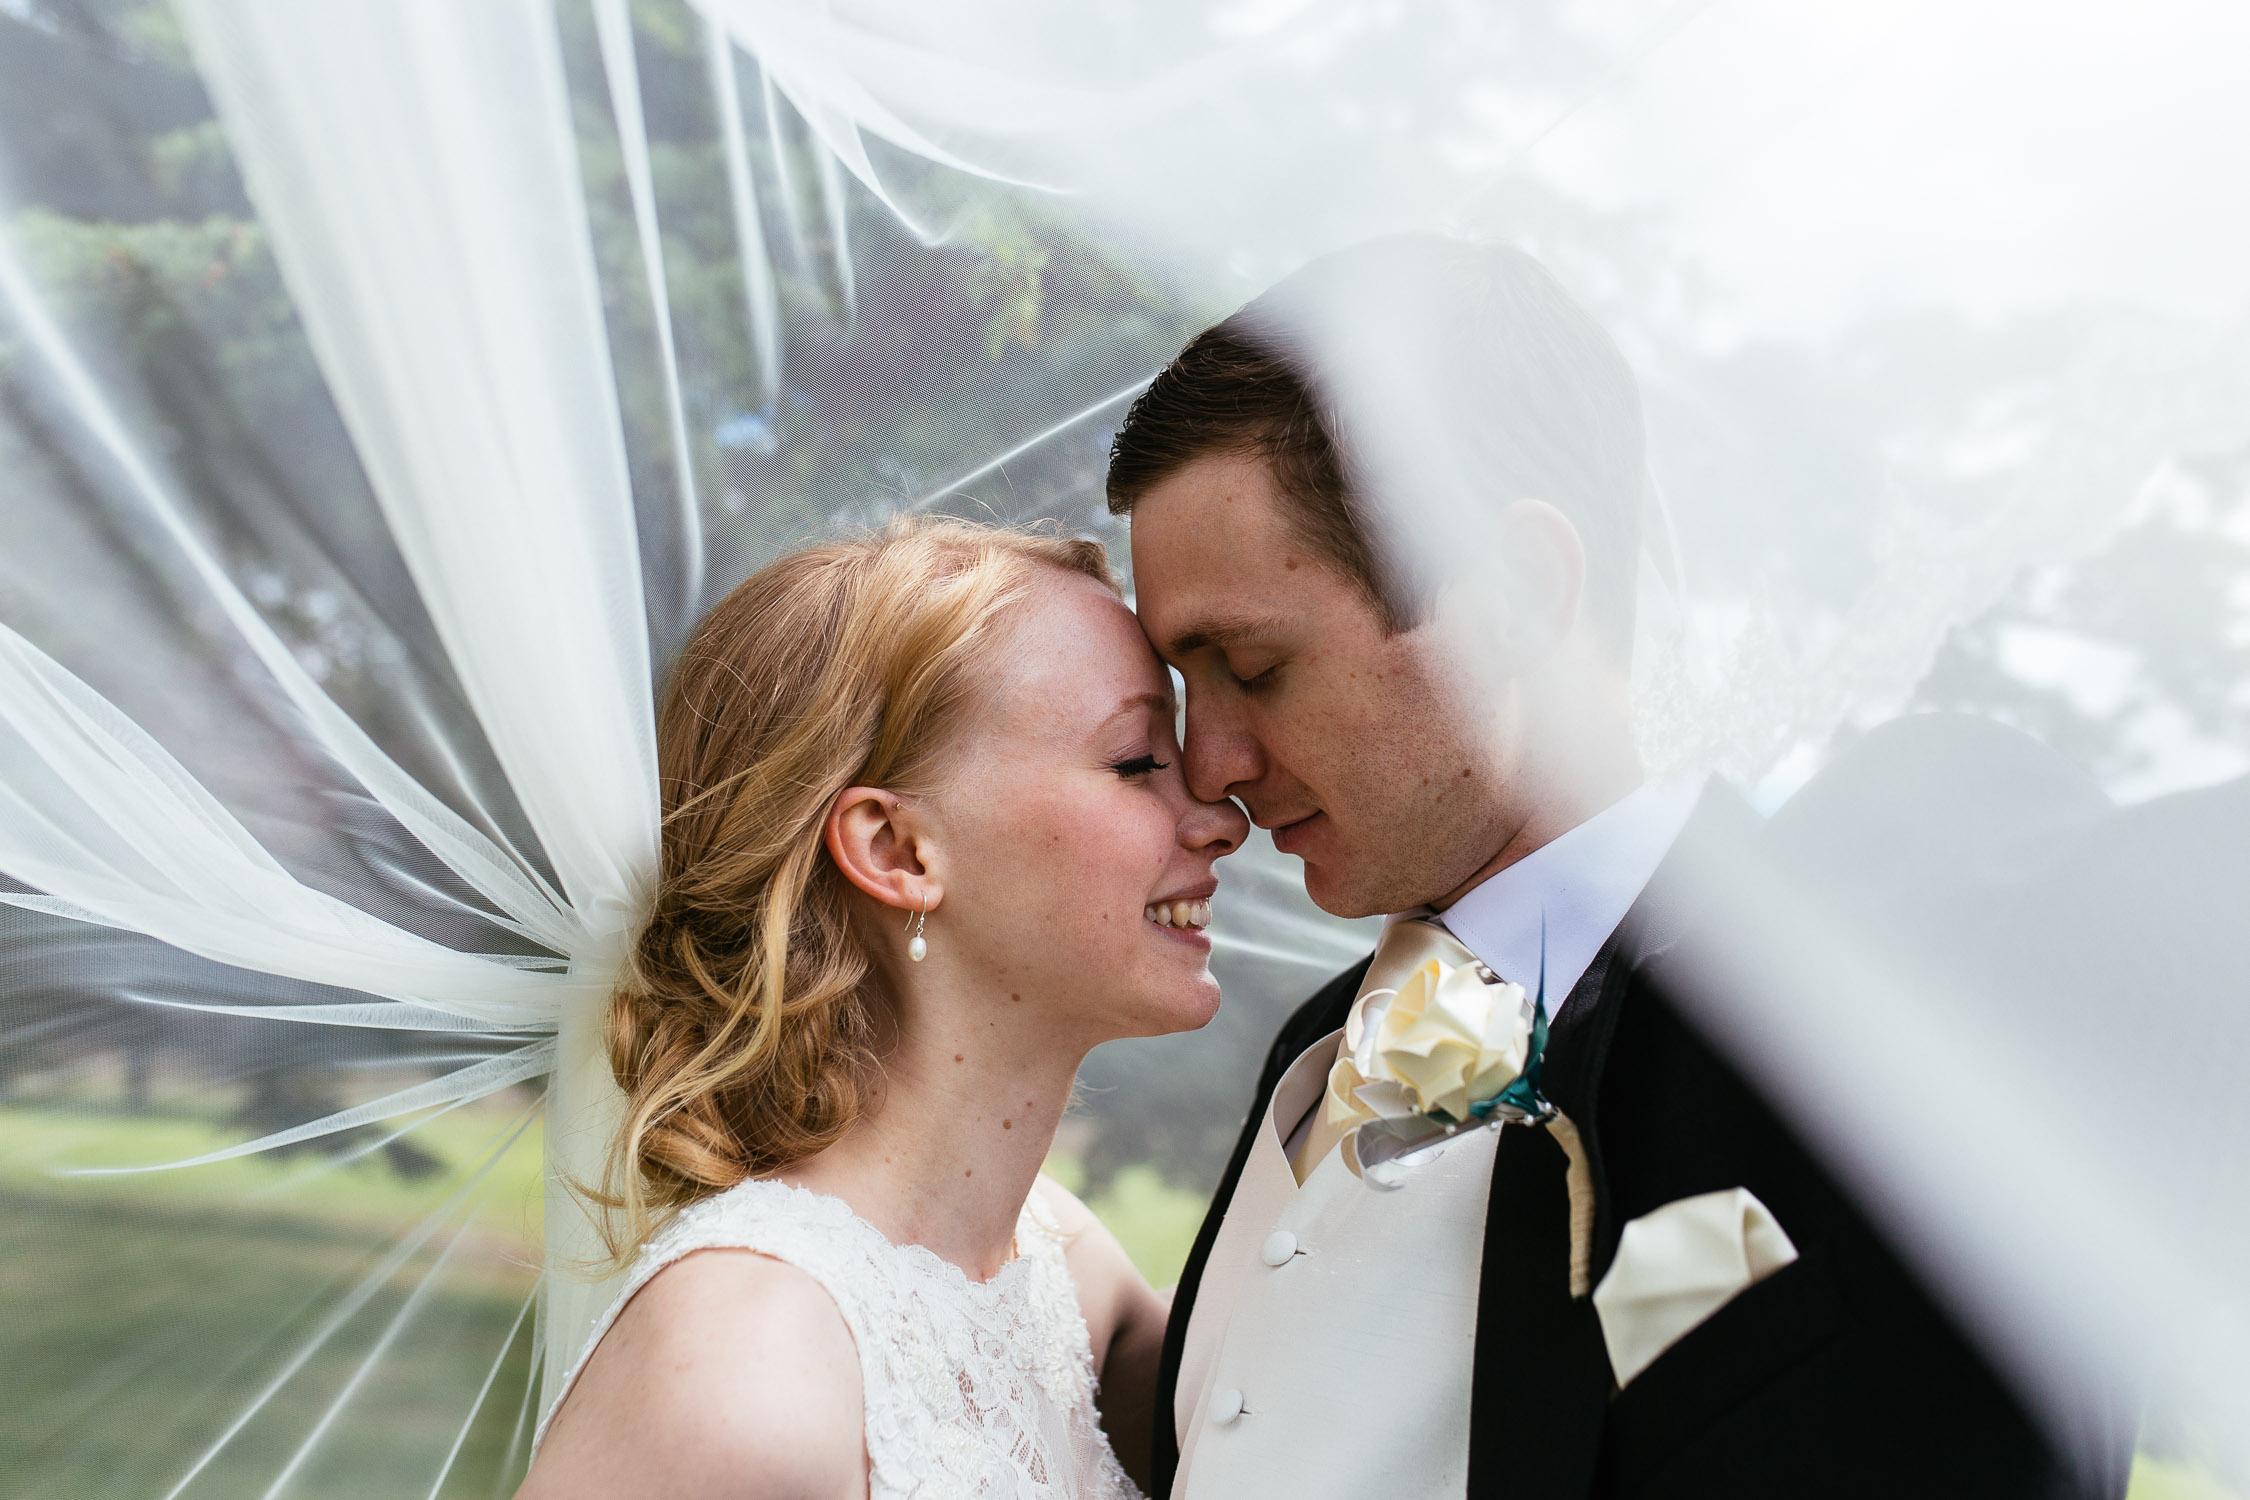 Lizi-and-Mark-Wedding-Highlights-46.jpg